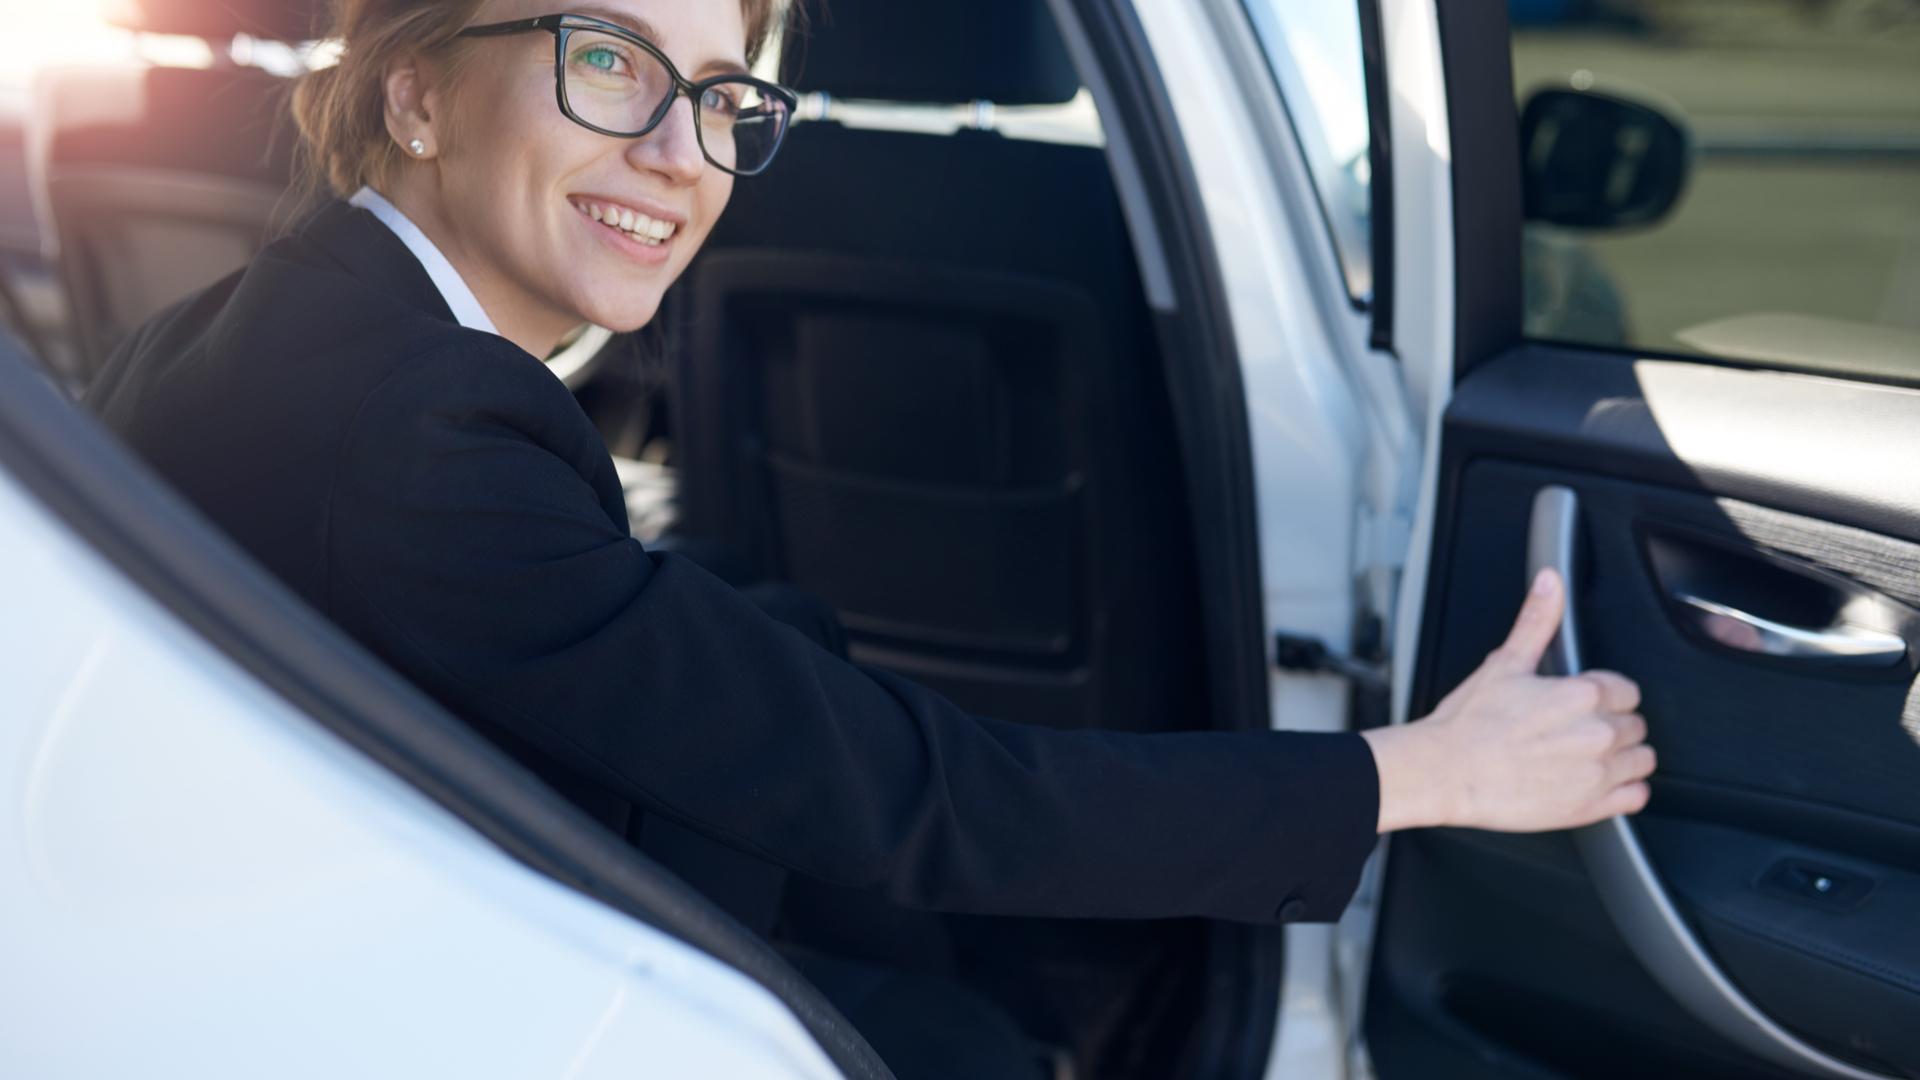 Business Car Insurance Explained Header Image